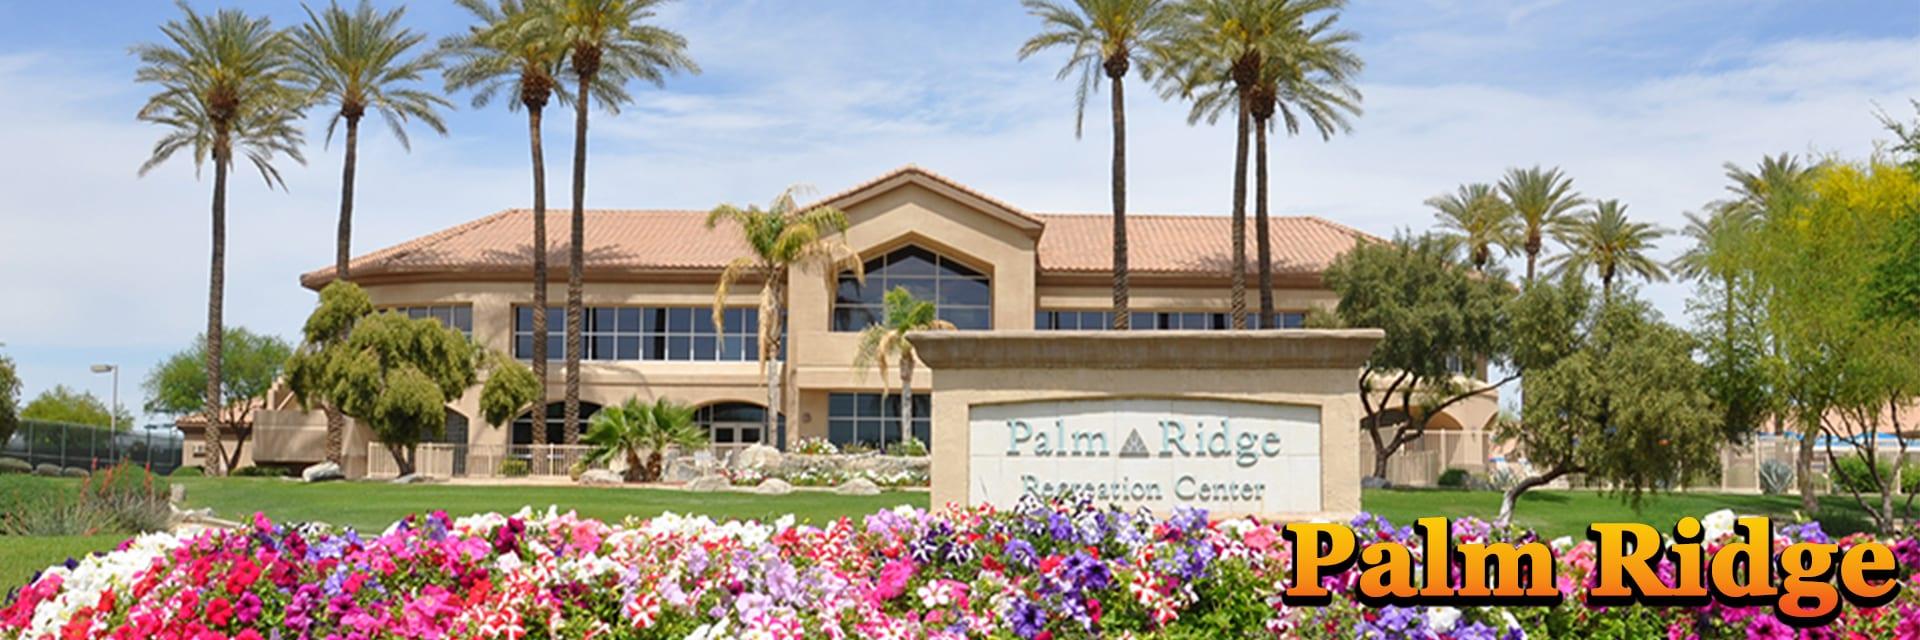 Palm Ridge Recreation Center at Sun City West AZ